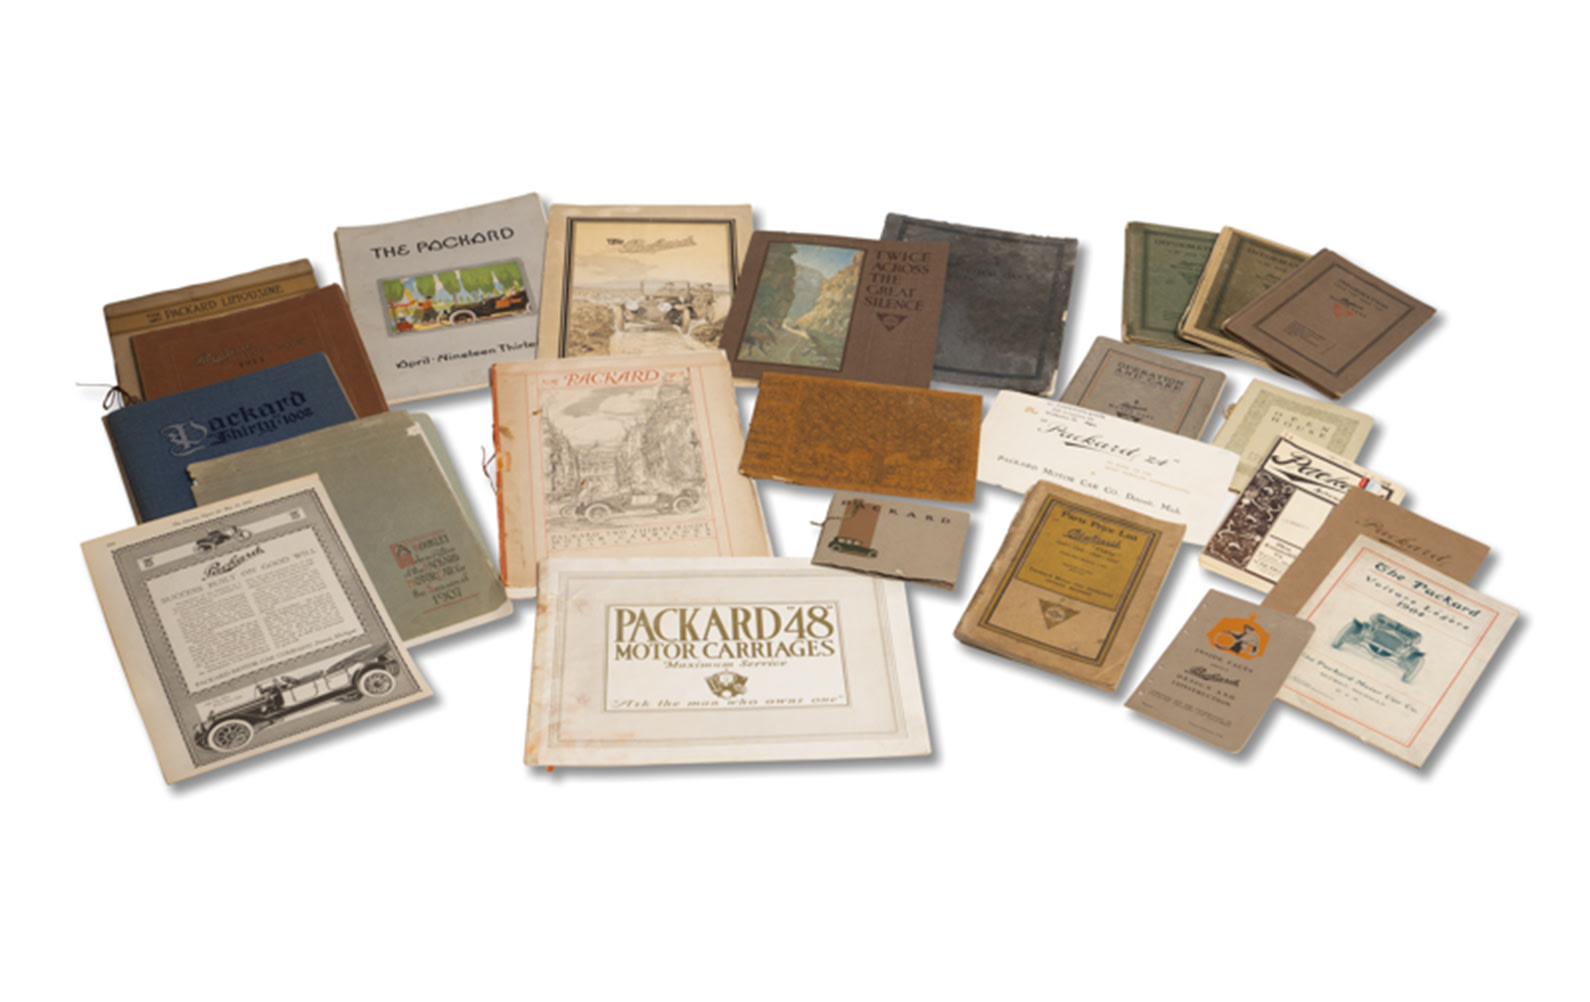 Assorted Packard Sales Literature, c. 1901–1915